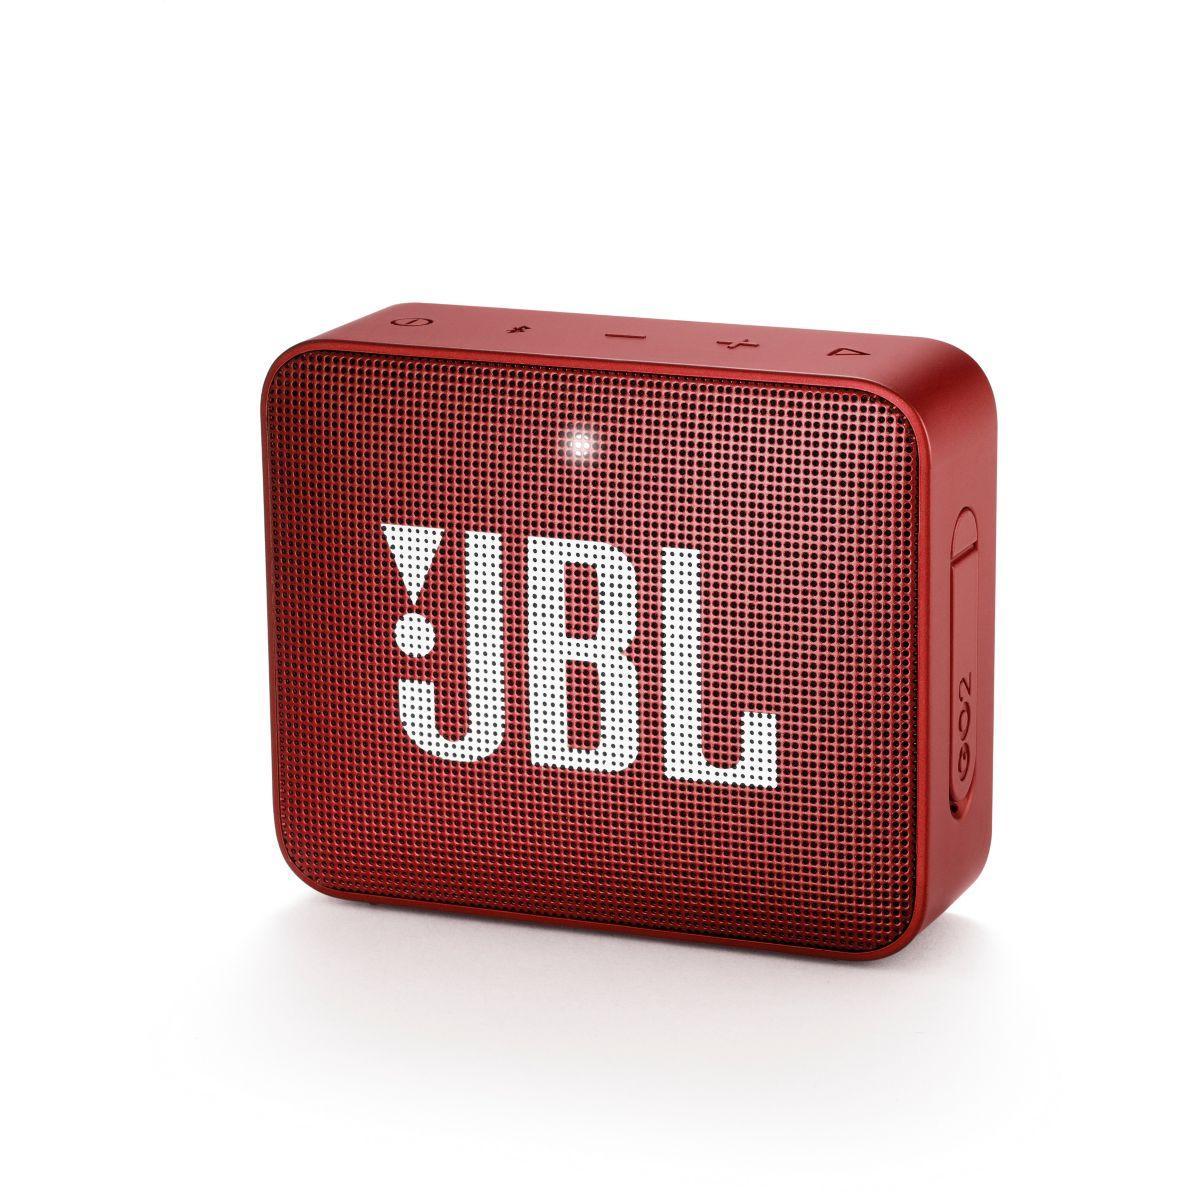 Enceinte bluetooth jbl go 2 rouge - livraison offerte : code liv (photo)